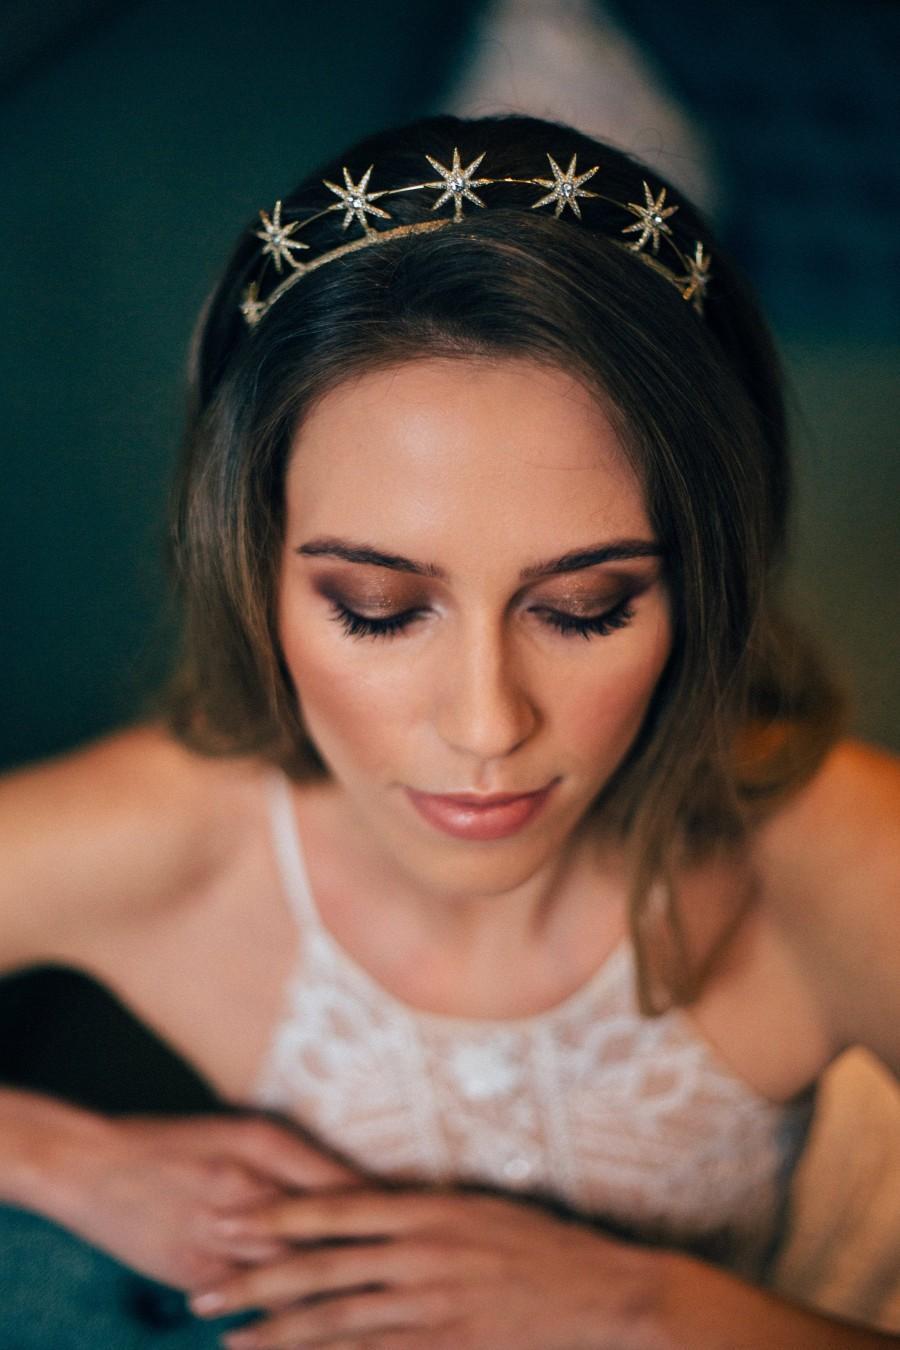 Wedding - Gold Star Crown/ Silver Star crown - Gold Wedding Tiara - Bridal  Hair Accessory -  Bridal Hair Accessory -Modern Bridal Crown Headpiece